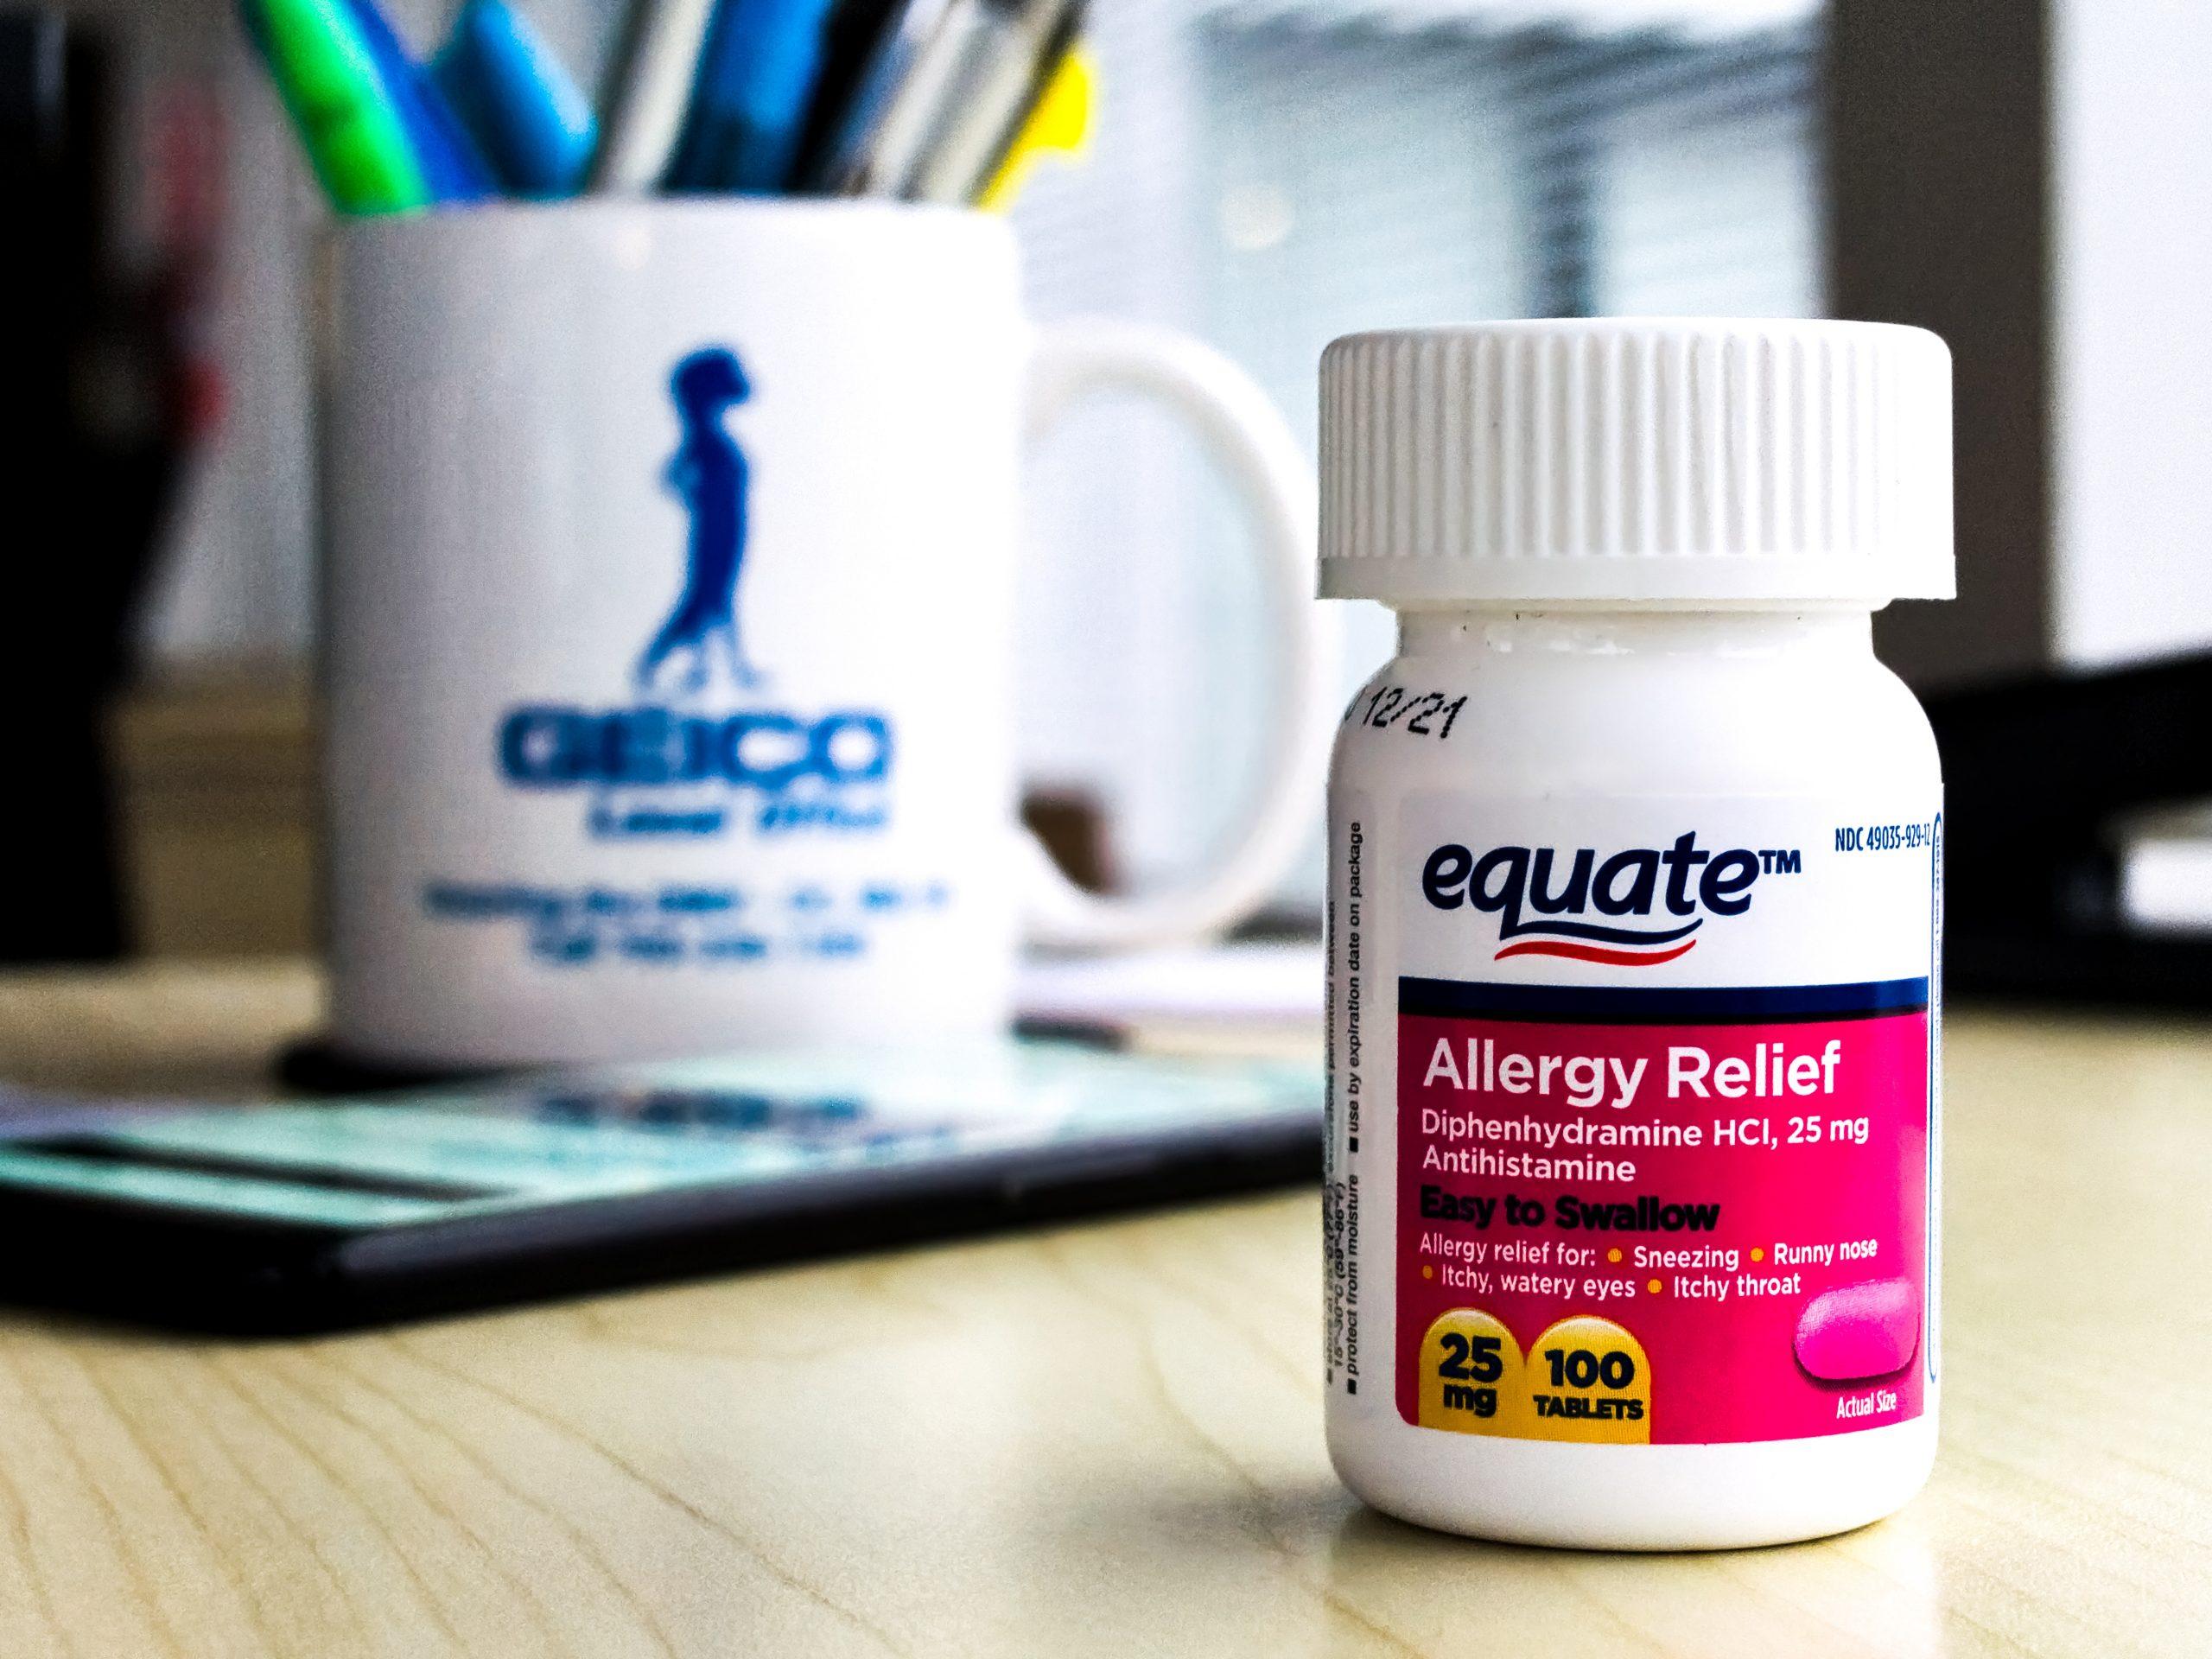 equate allergy relief tablets 100 tablets bottle